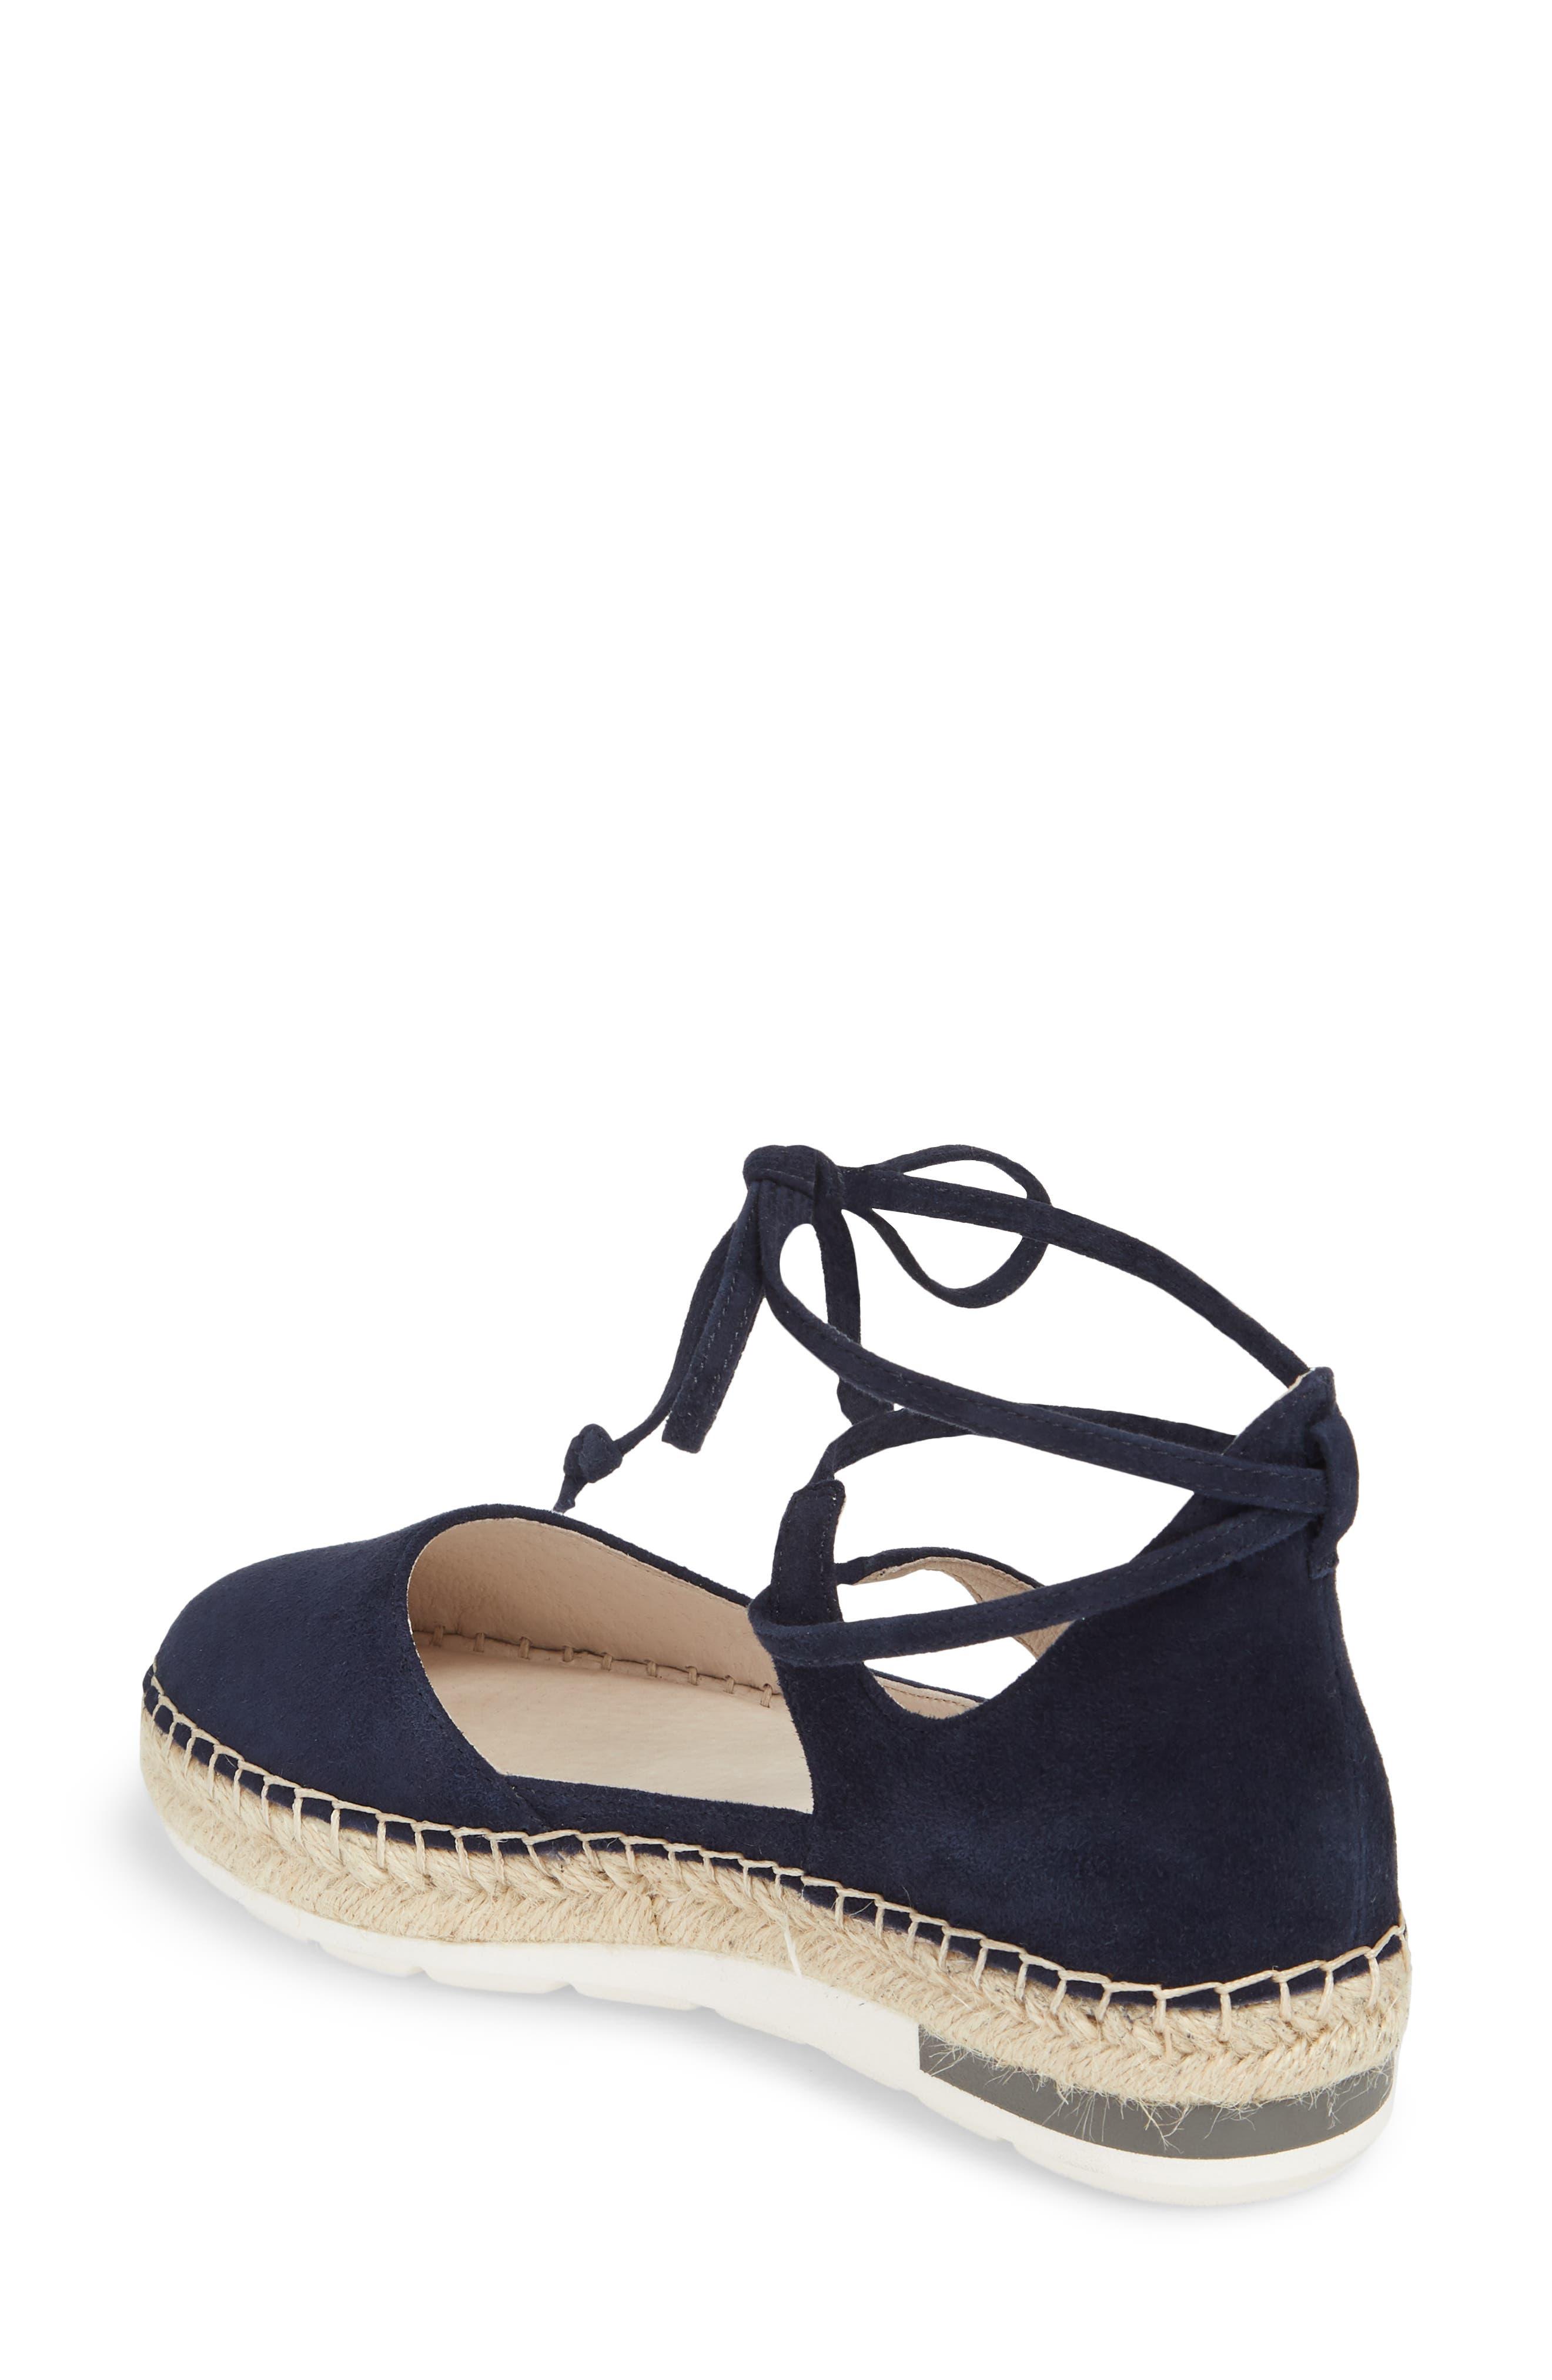 Leena Ankle Strap Sandal,                             Alternate thumbnail 2, color,                             Navy Suede